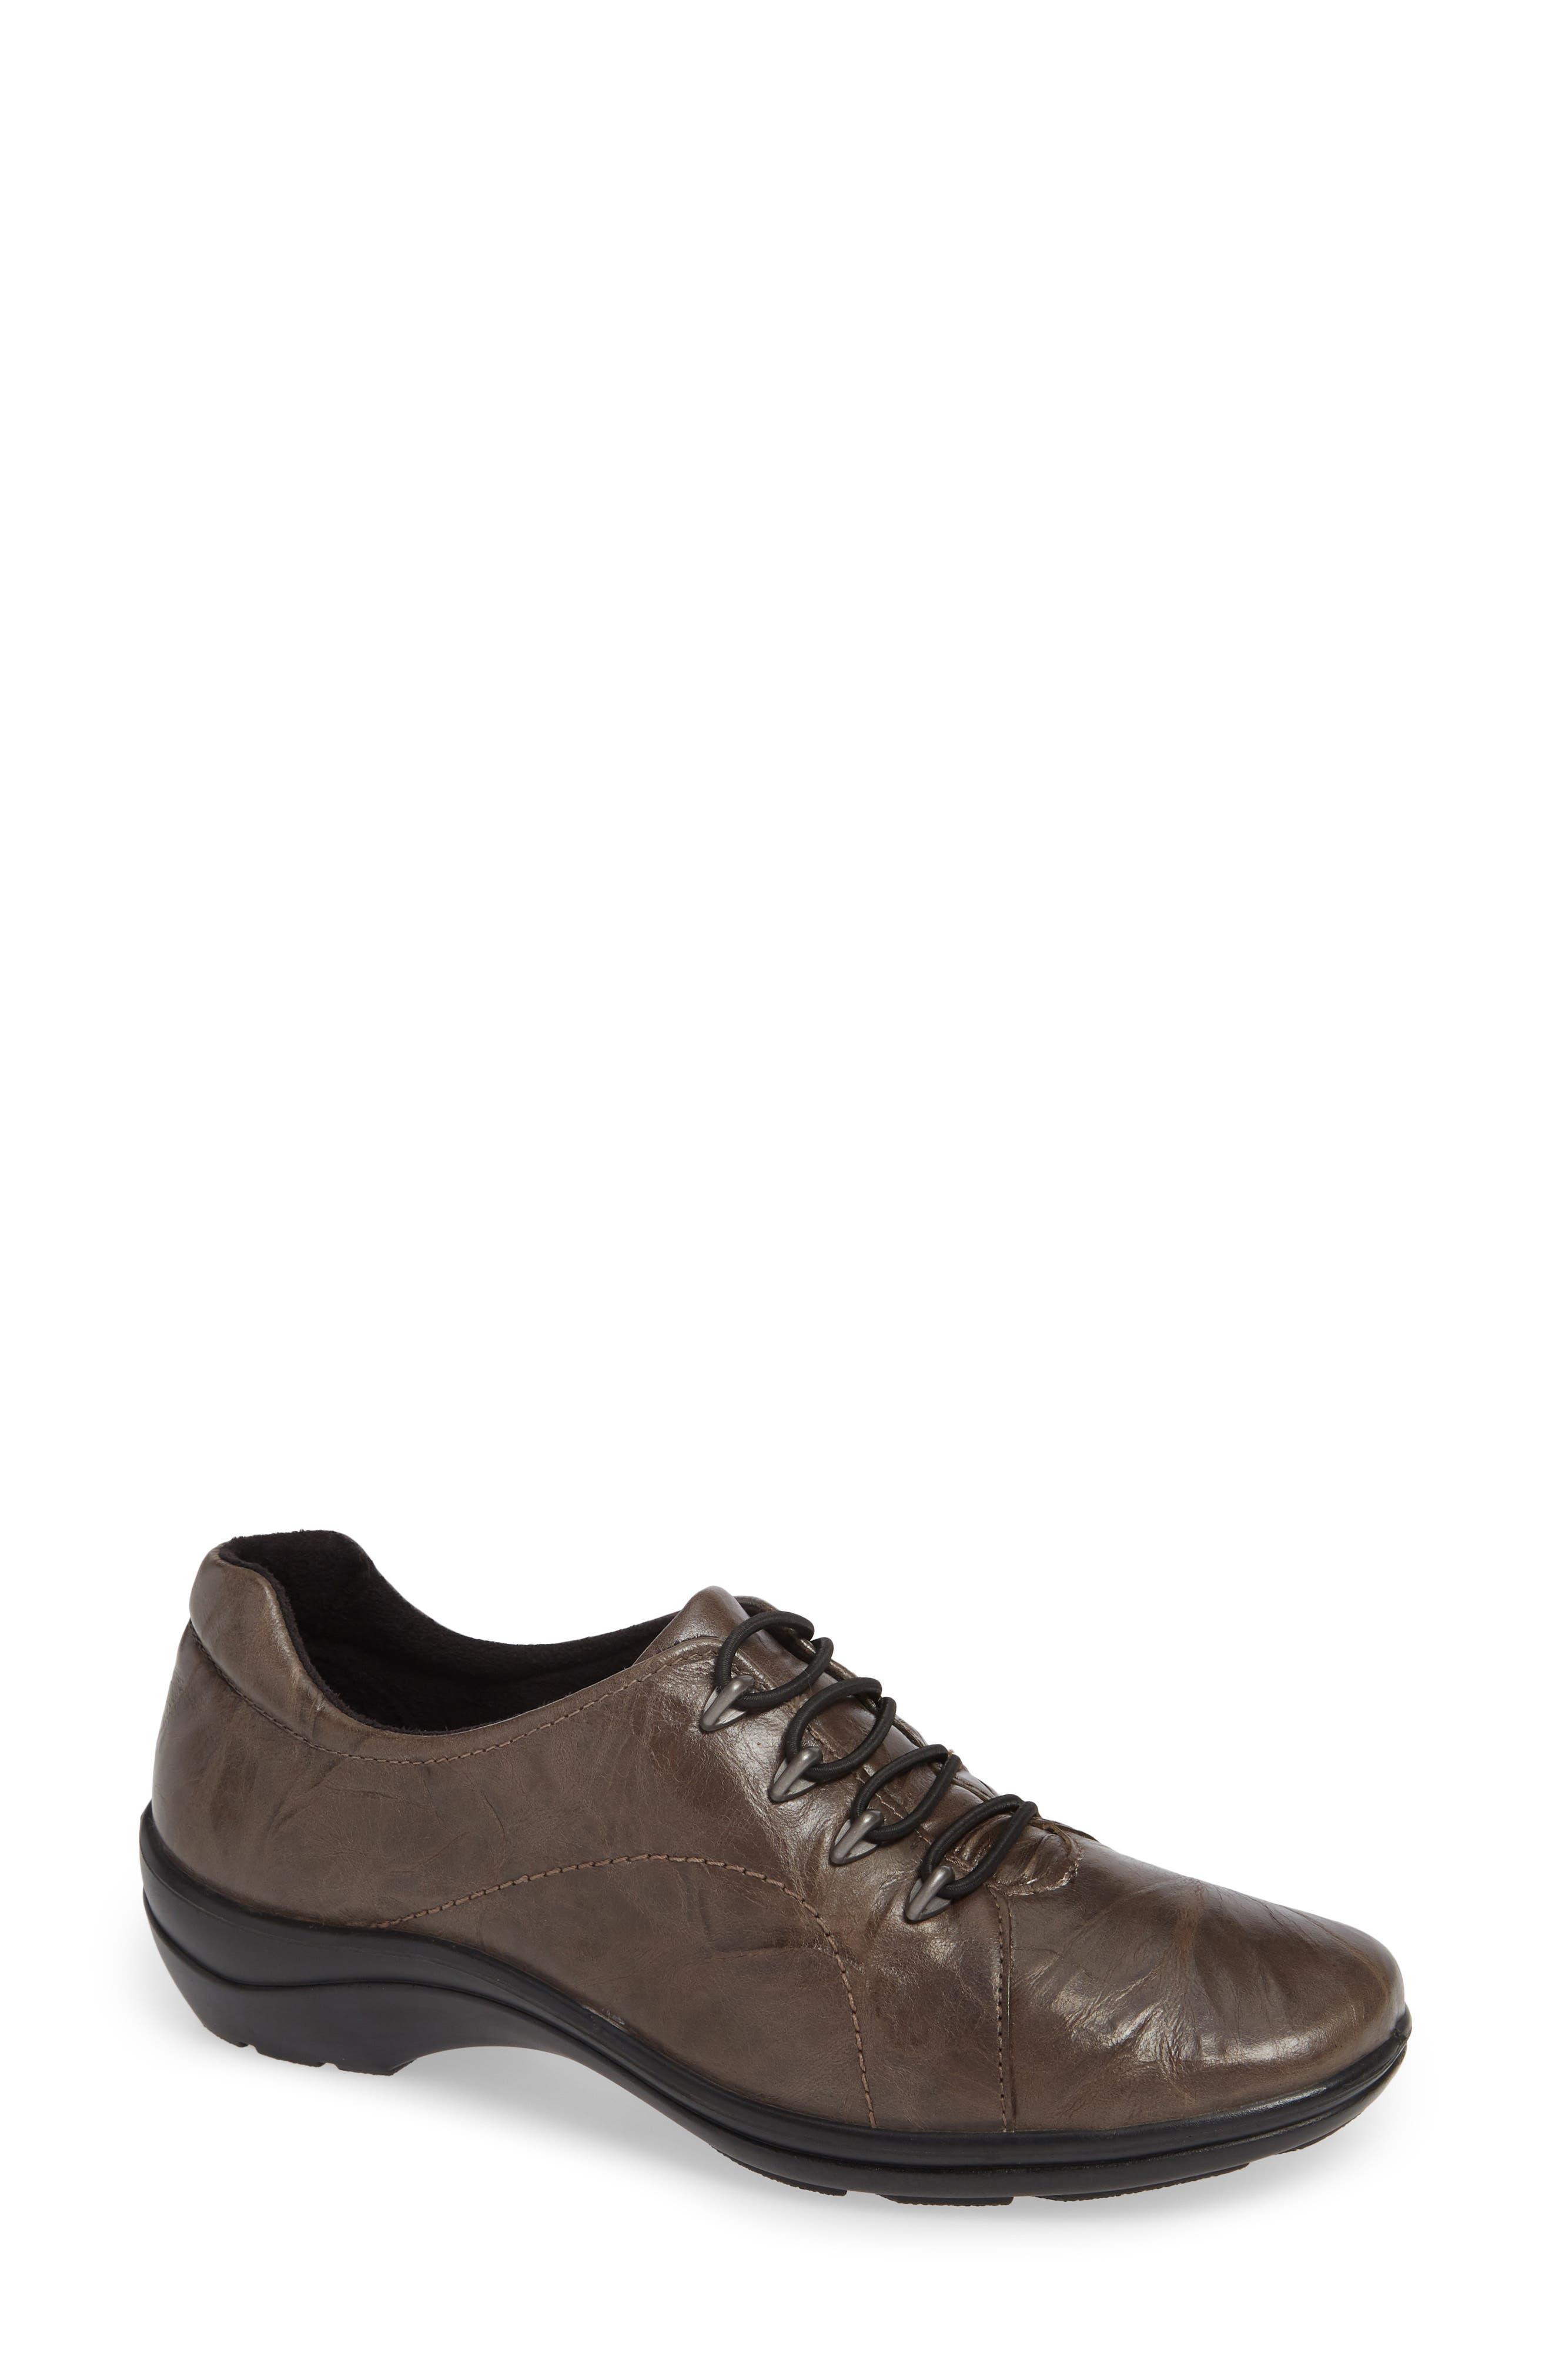 Romika Cassie 42 Sneaker, Grey